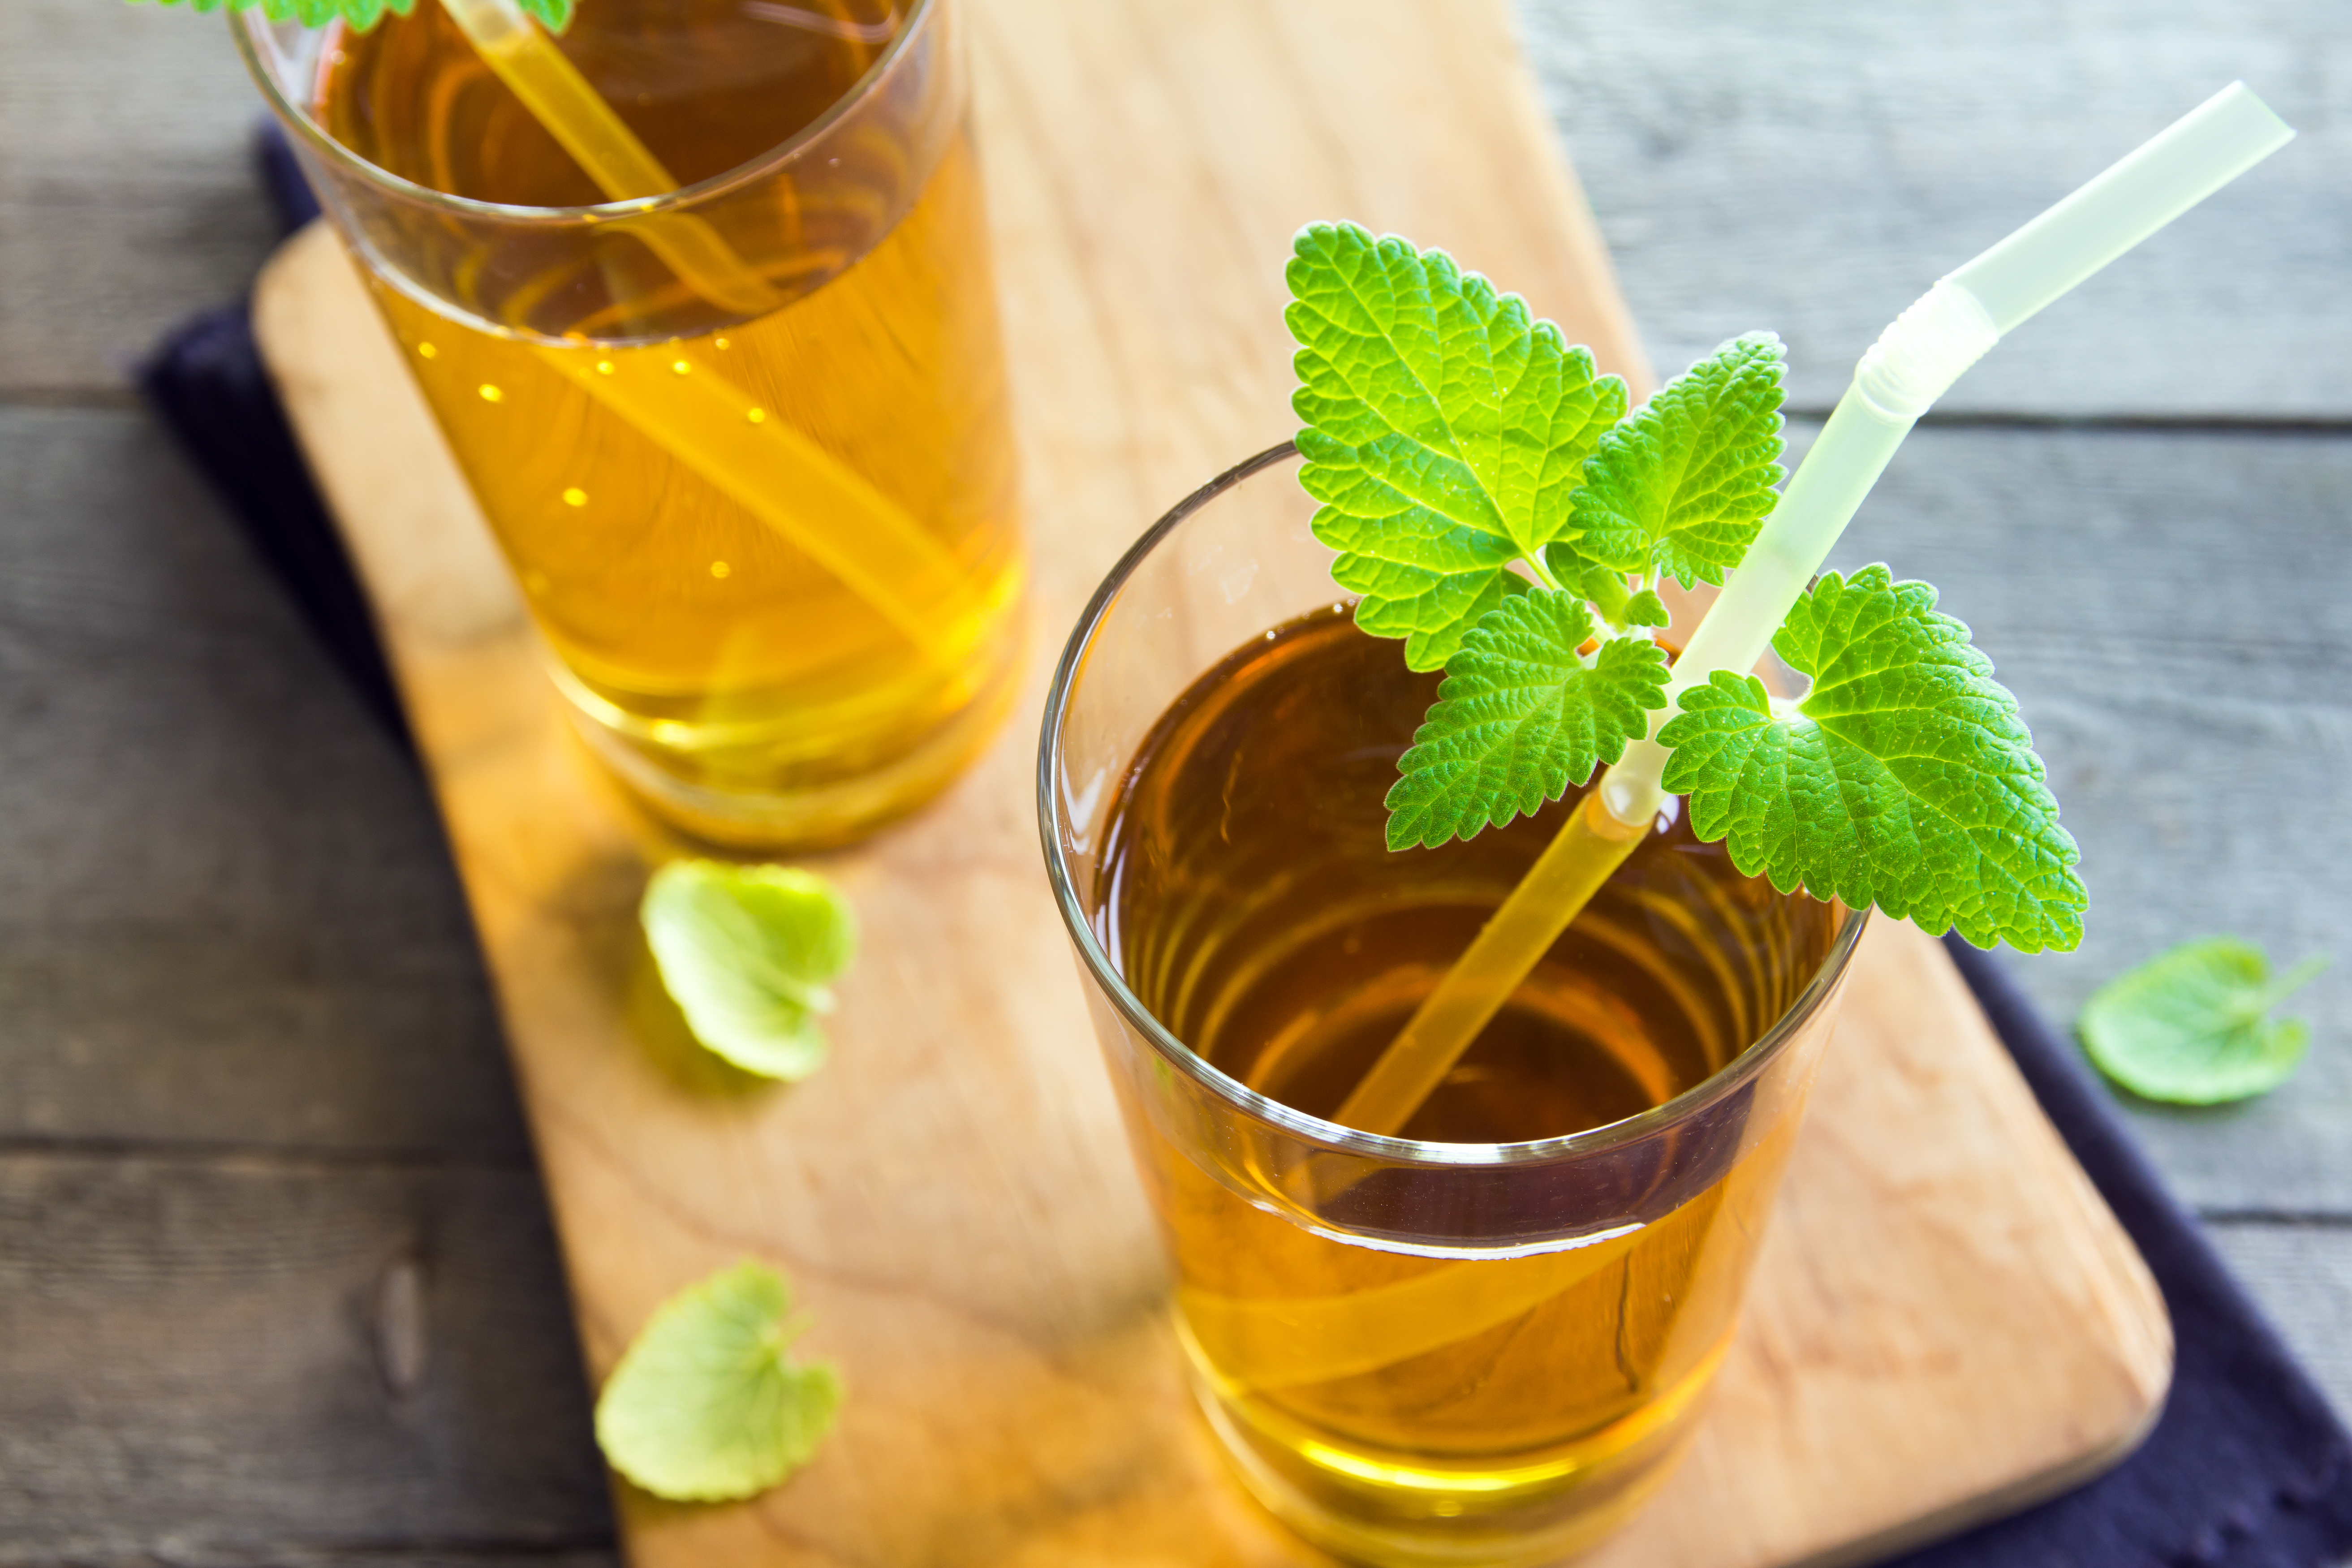 Minty Kombucha Beverage